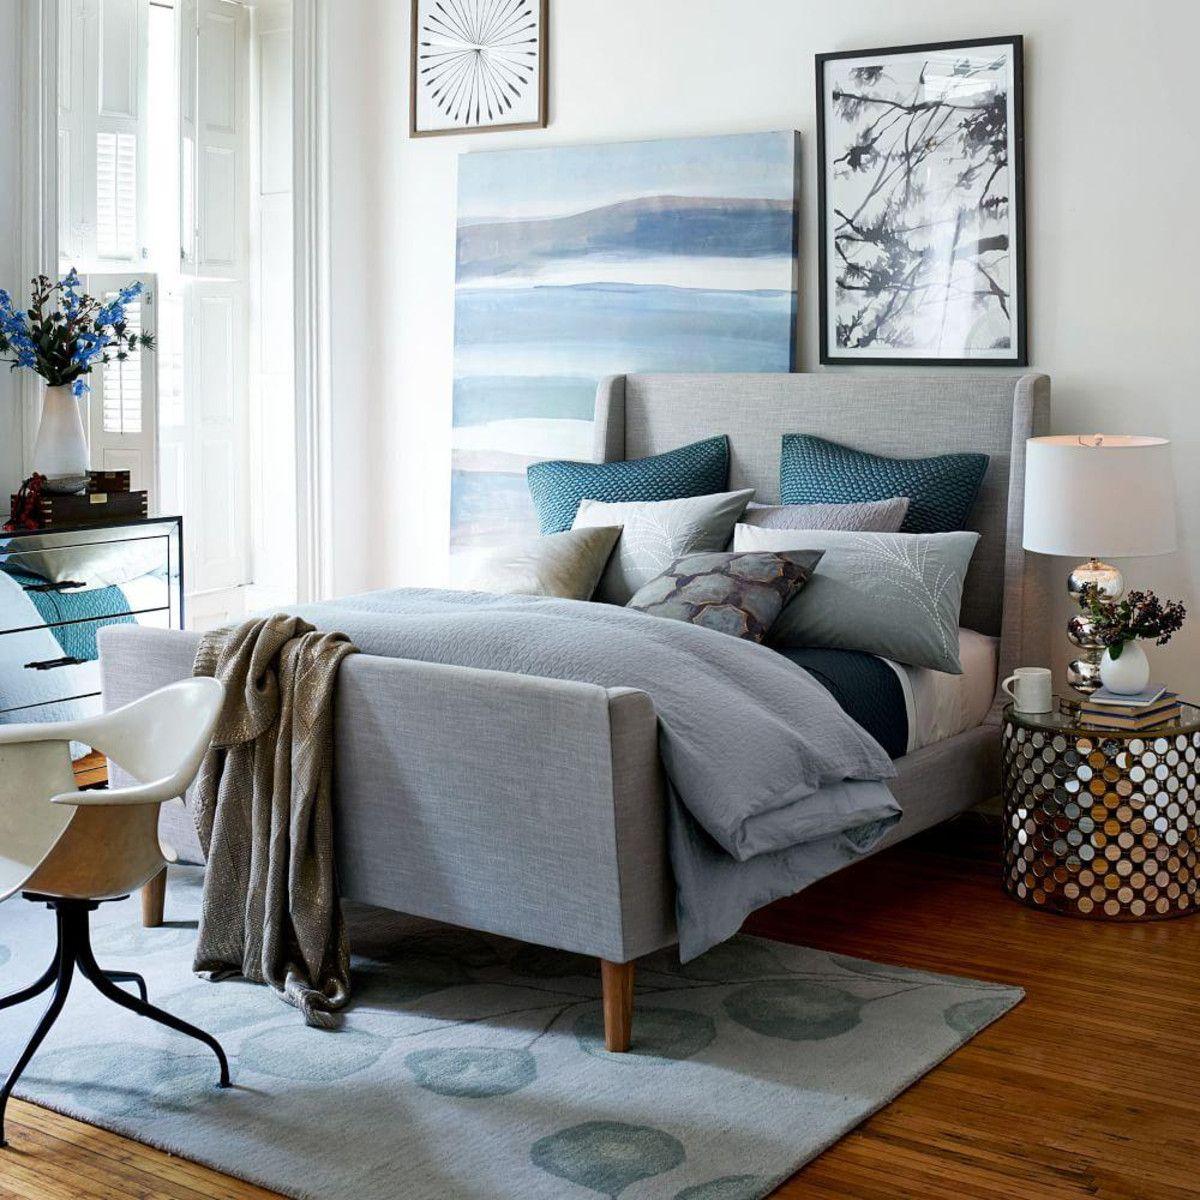 West Elm upholstered sleigh bed £799 £1099 Upholstered